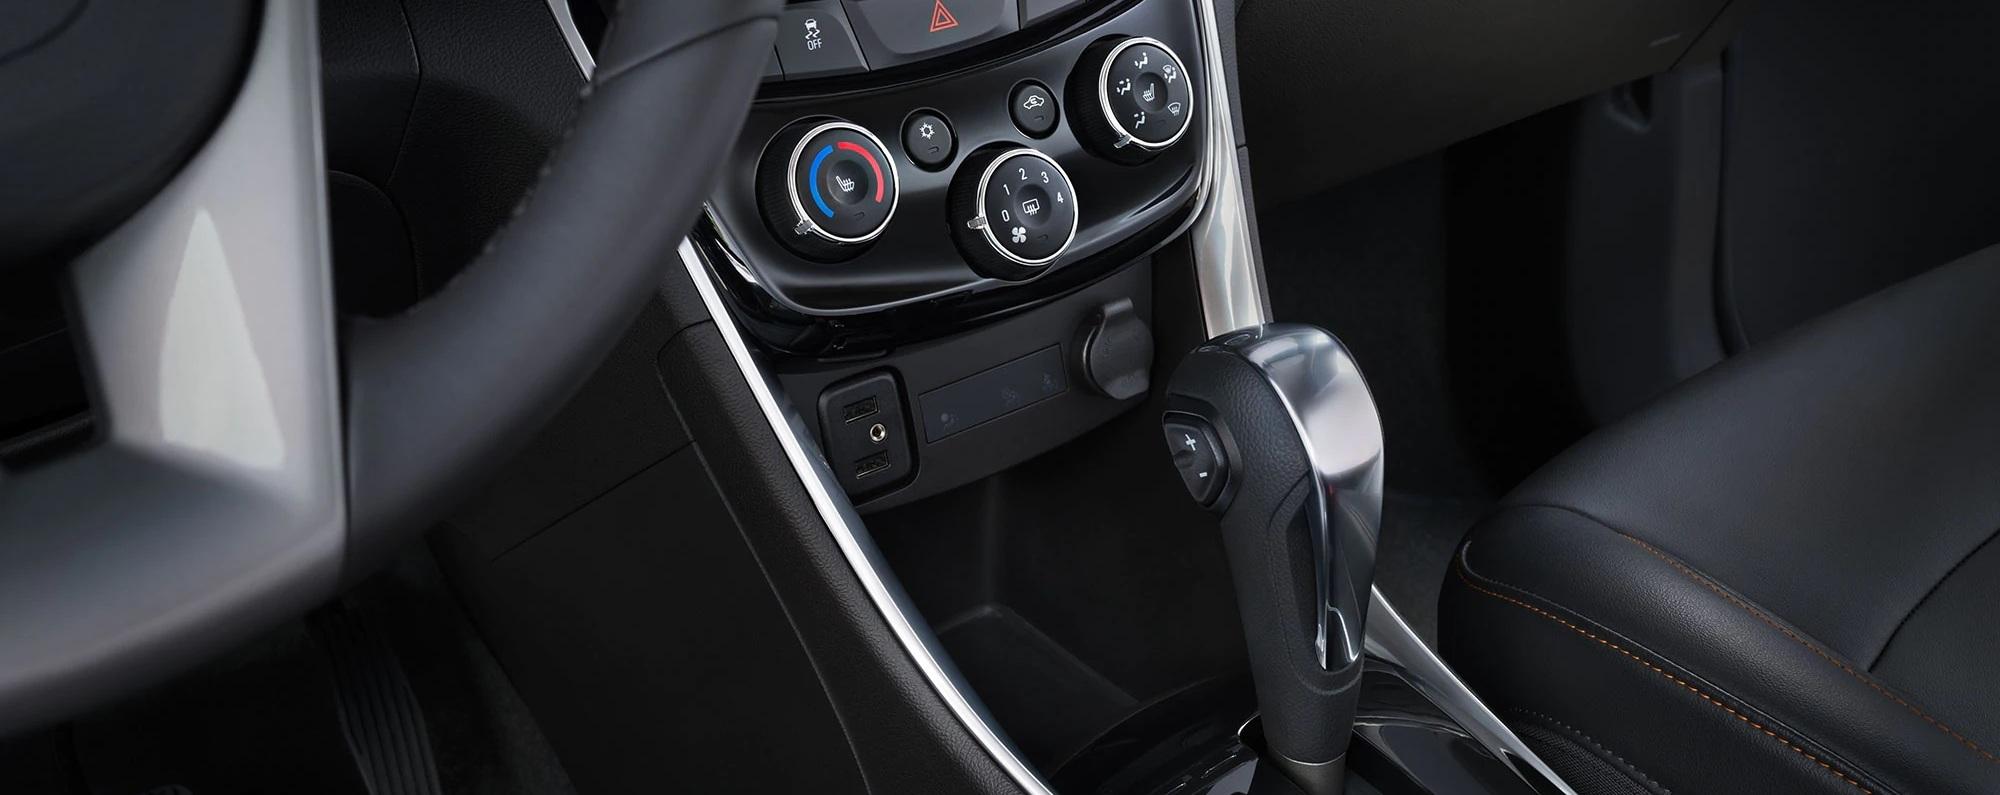 2020 Chevrolet Trax Center Stack